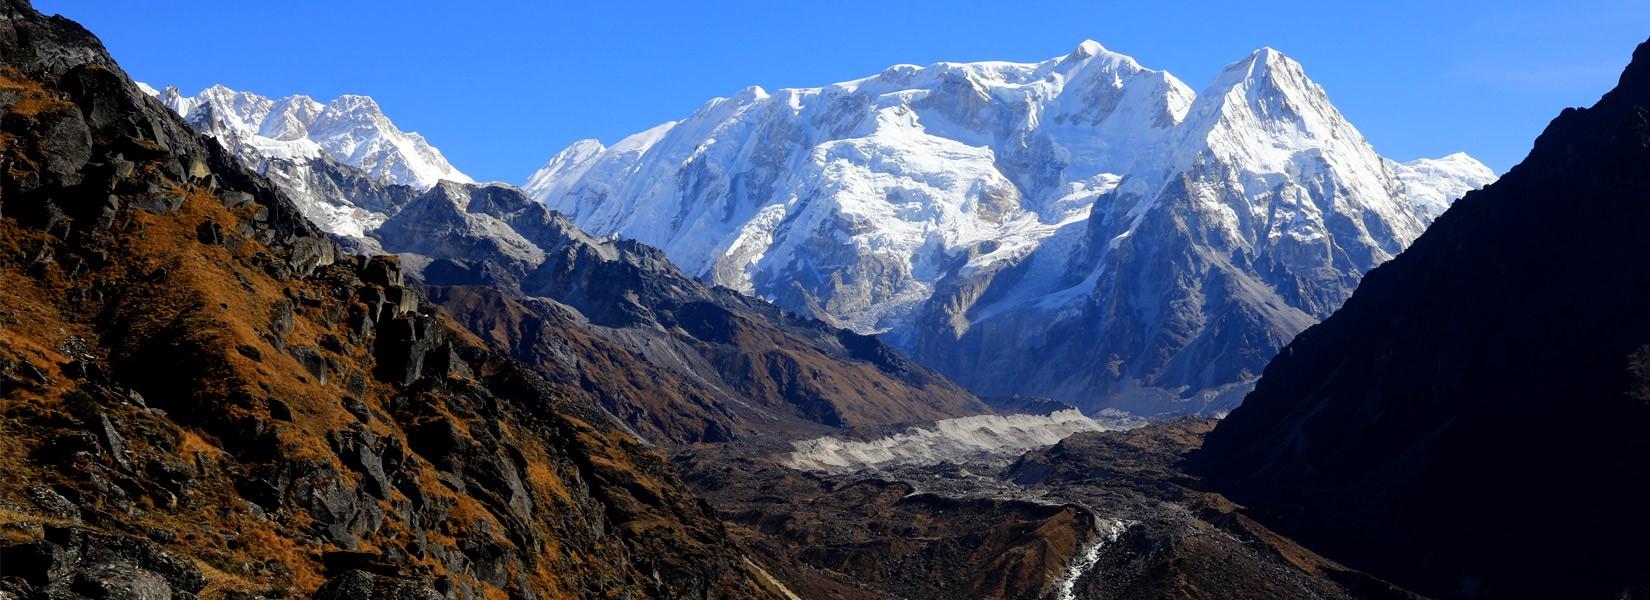 Mt. Kanchenjunga and Yalung Kang glacier